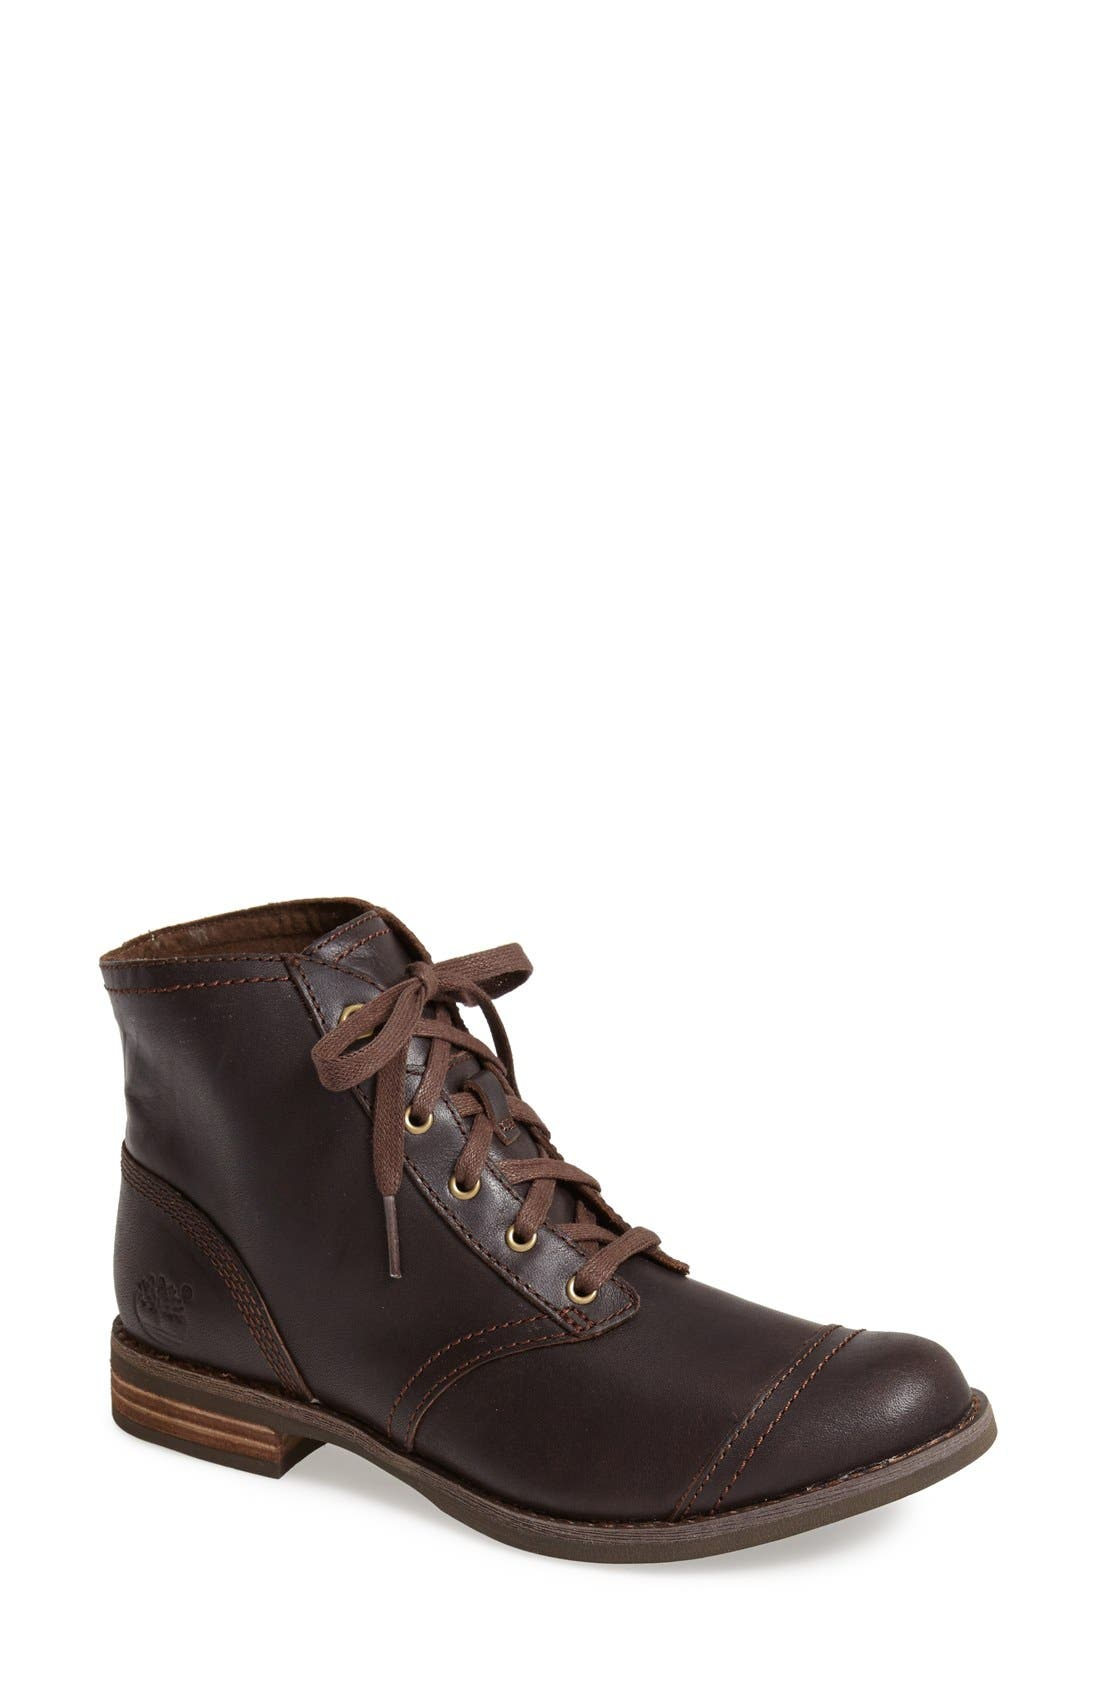 Alternate Image 1 Selected - Timberland 'Savin Hill' Leather Chukka Bootie (Women)